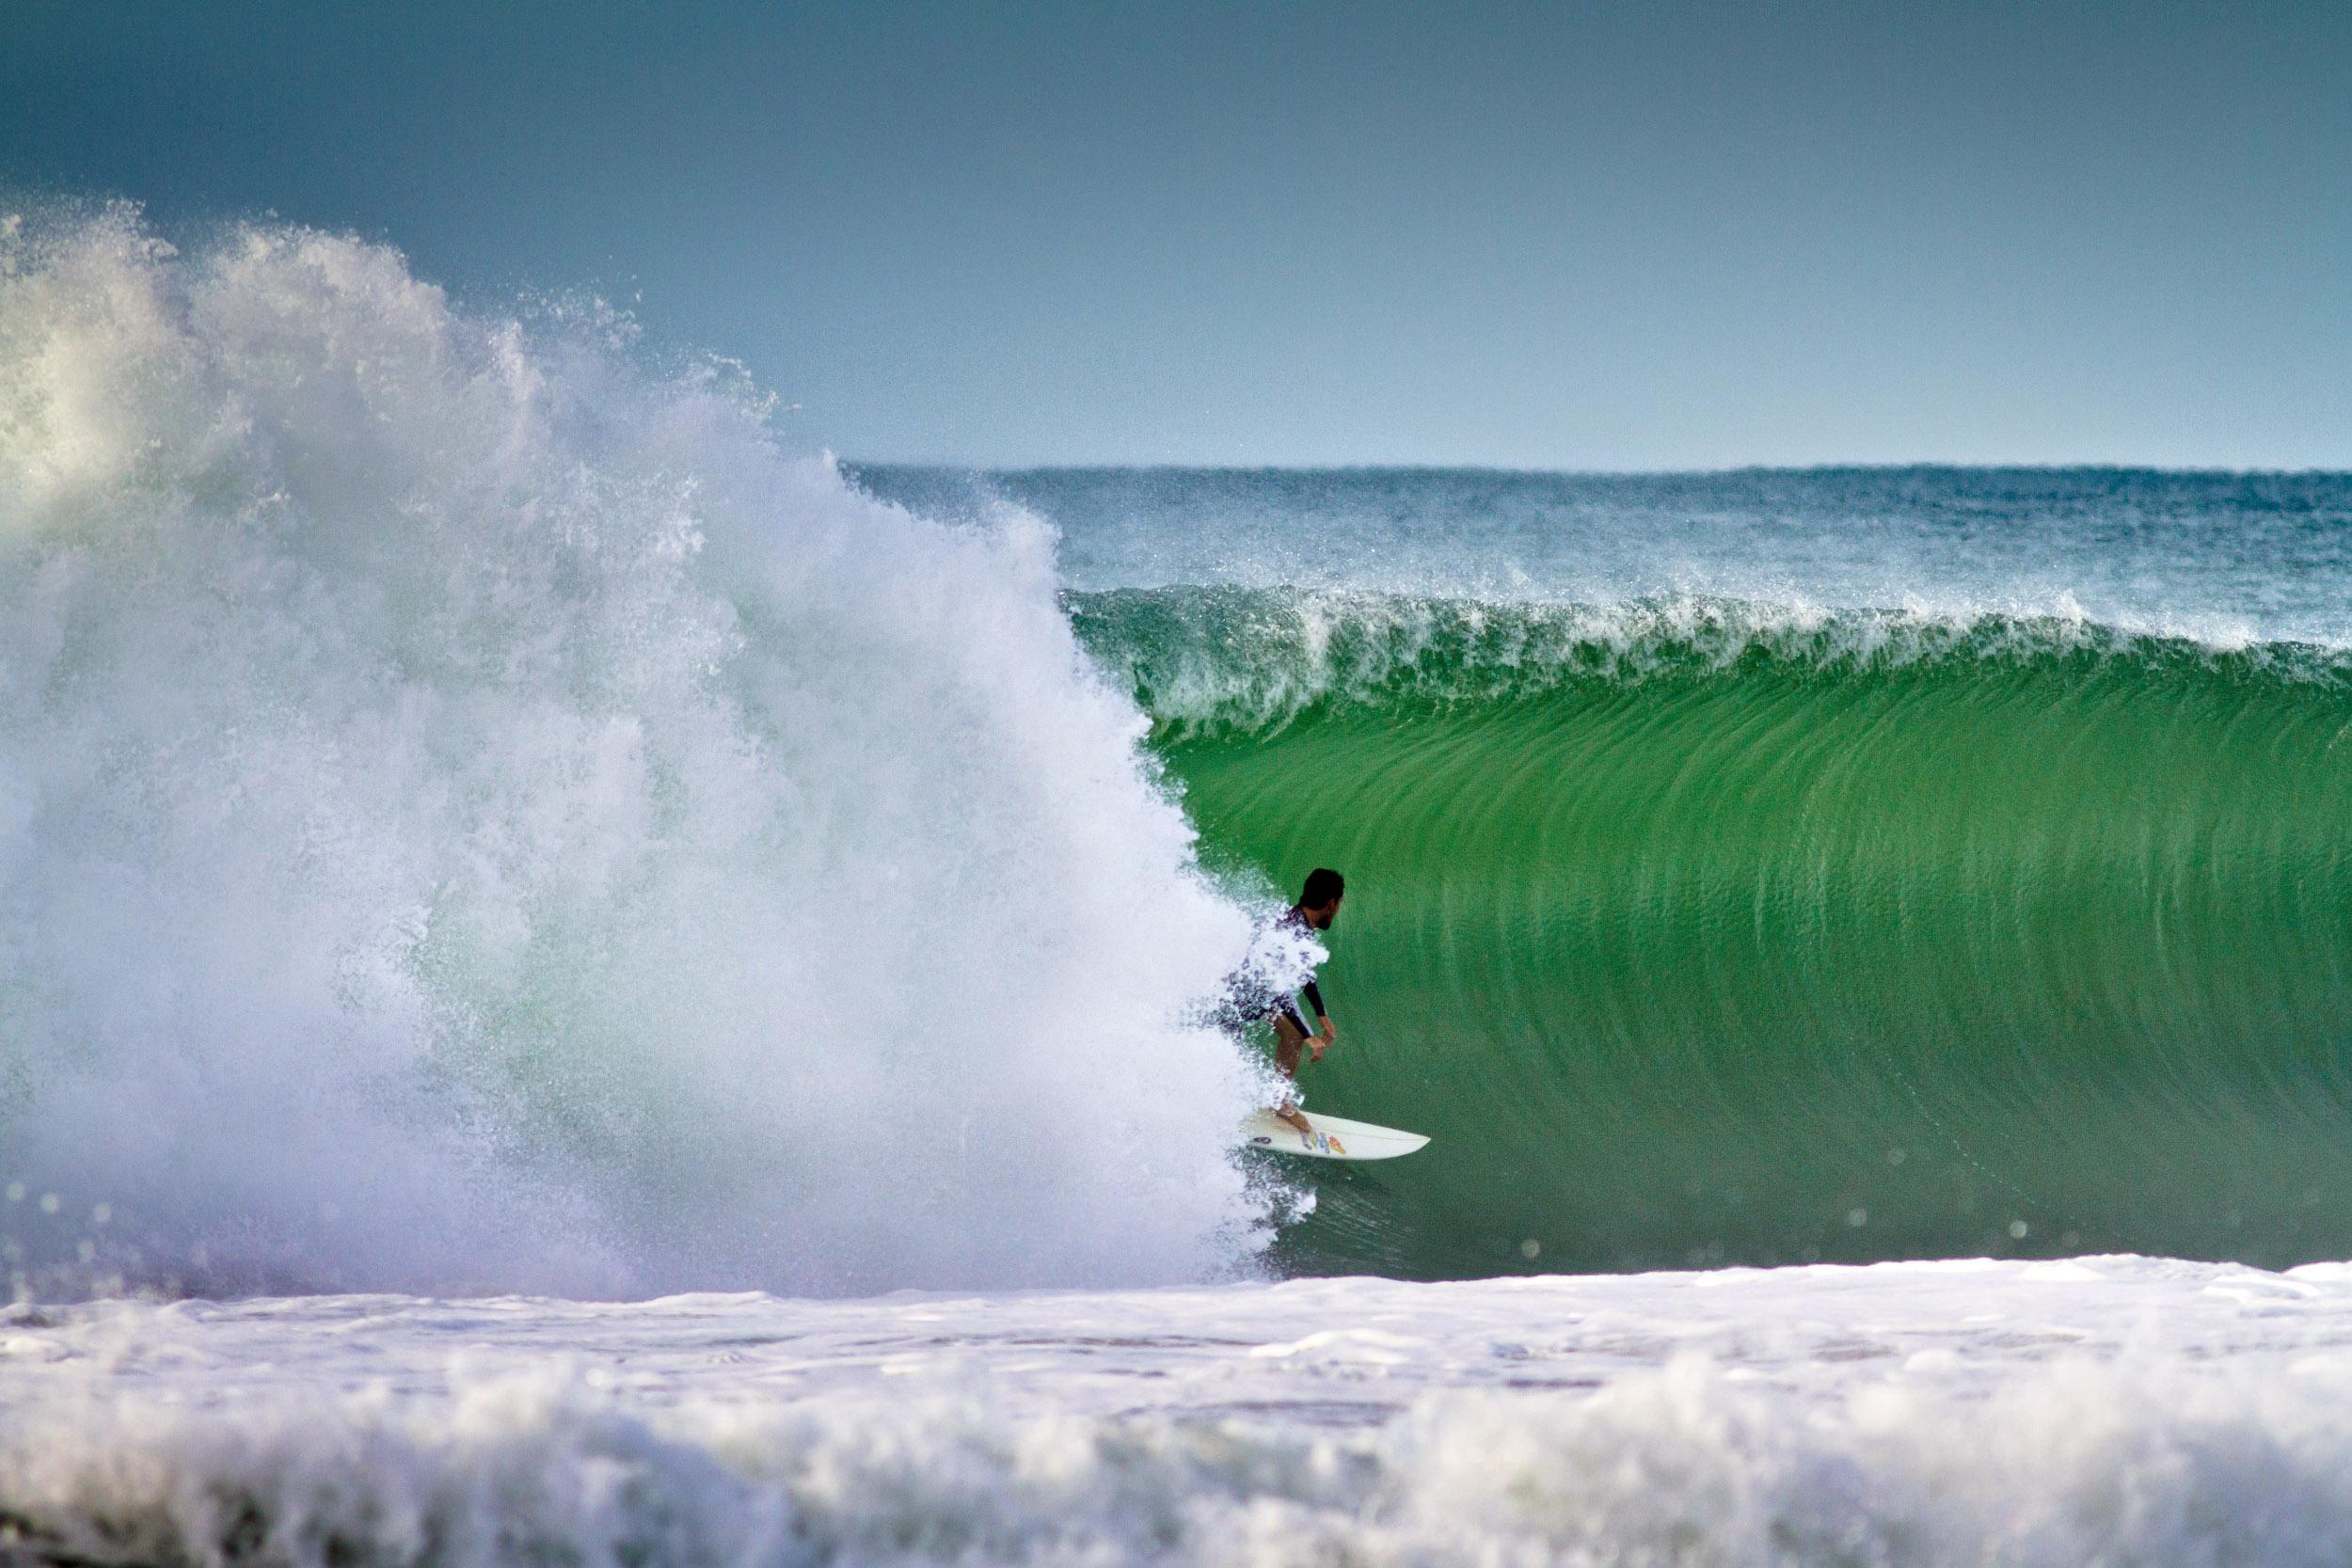 surf-photography-of-harley-ingleby-S563-210.jpg